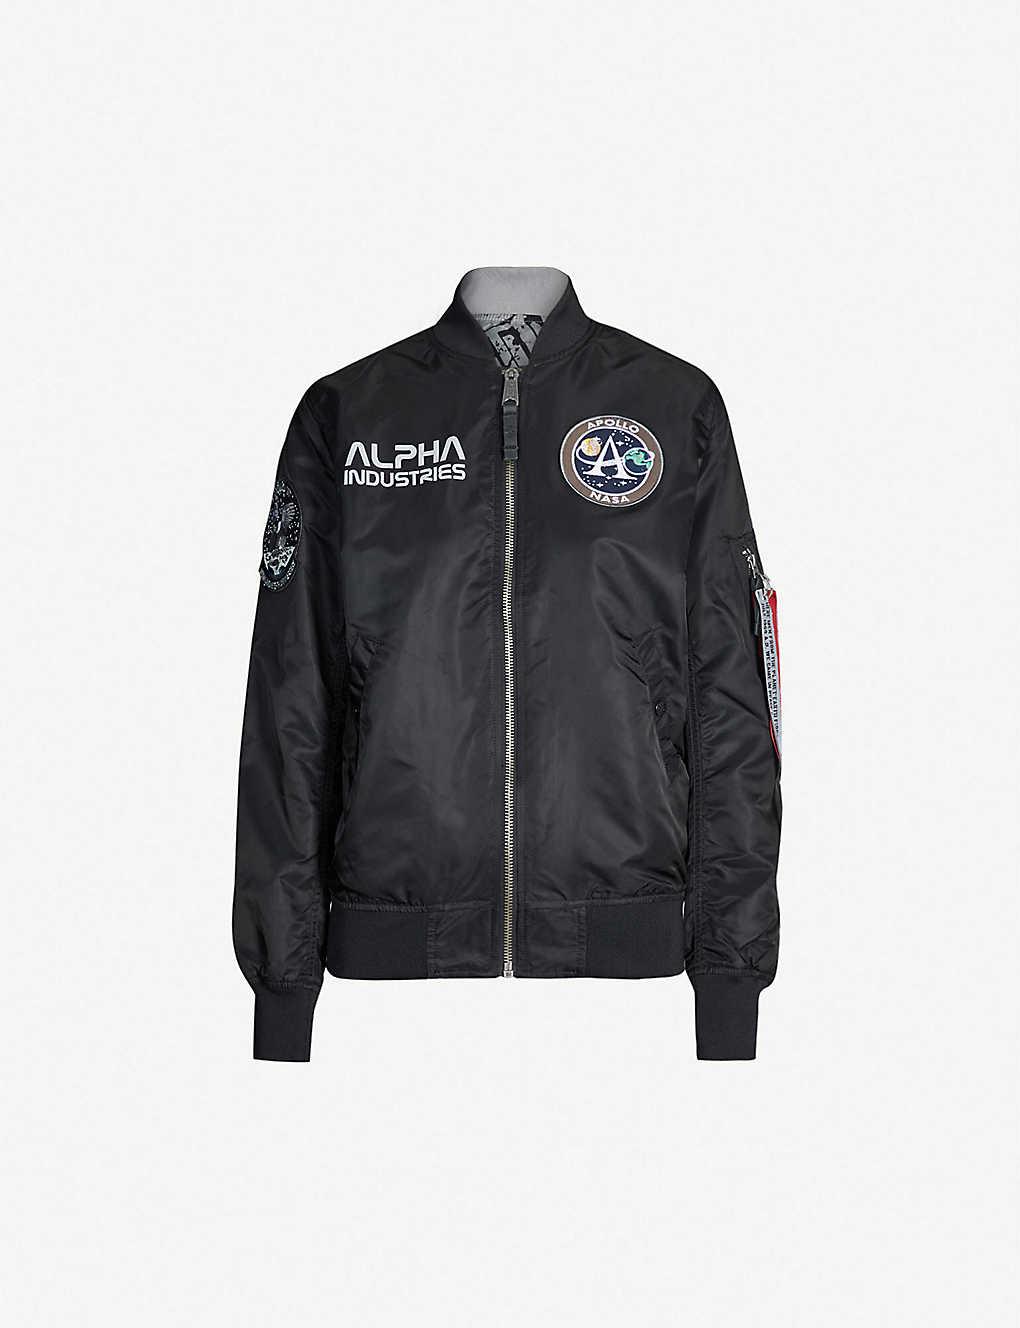 1c573caeabe5b4 ALPHA INDUSTRIES - MA-1 Moon Landing reversible shell bomber jacket ...